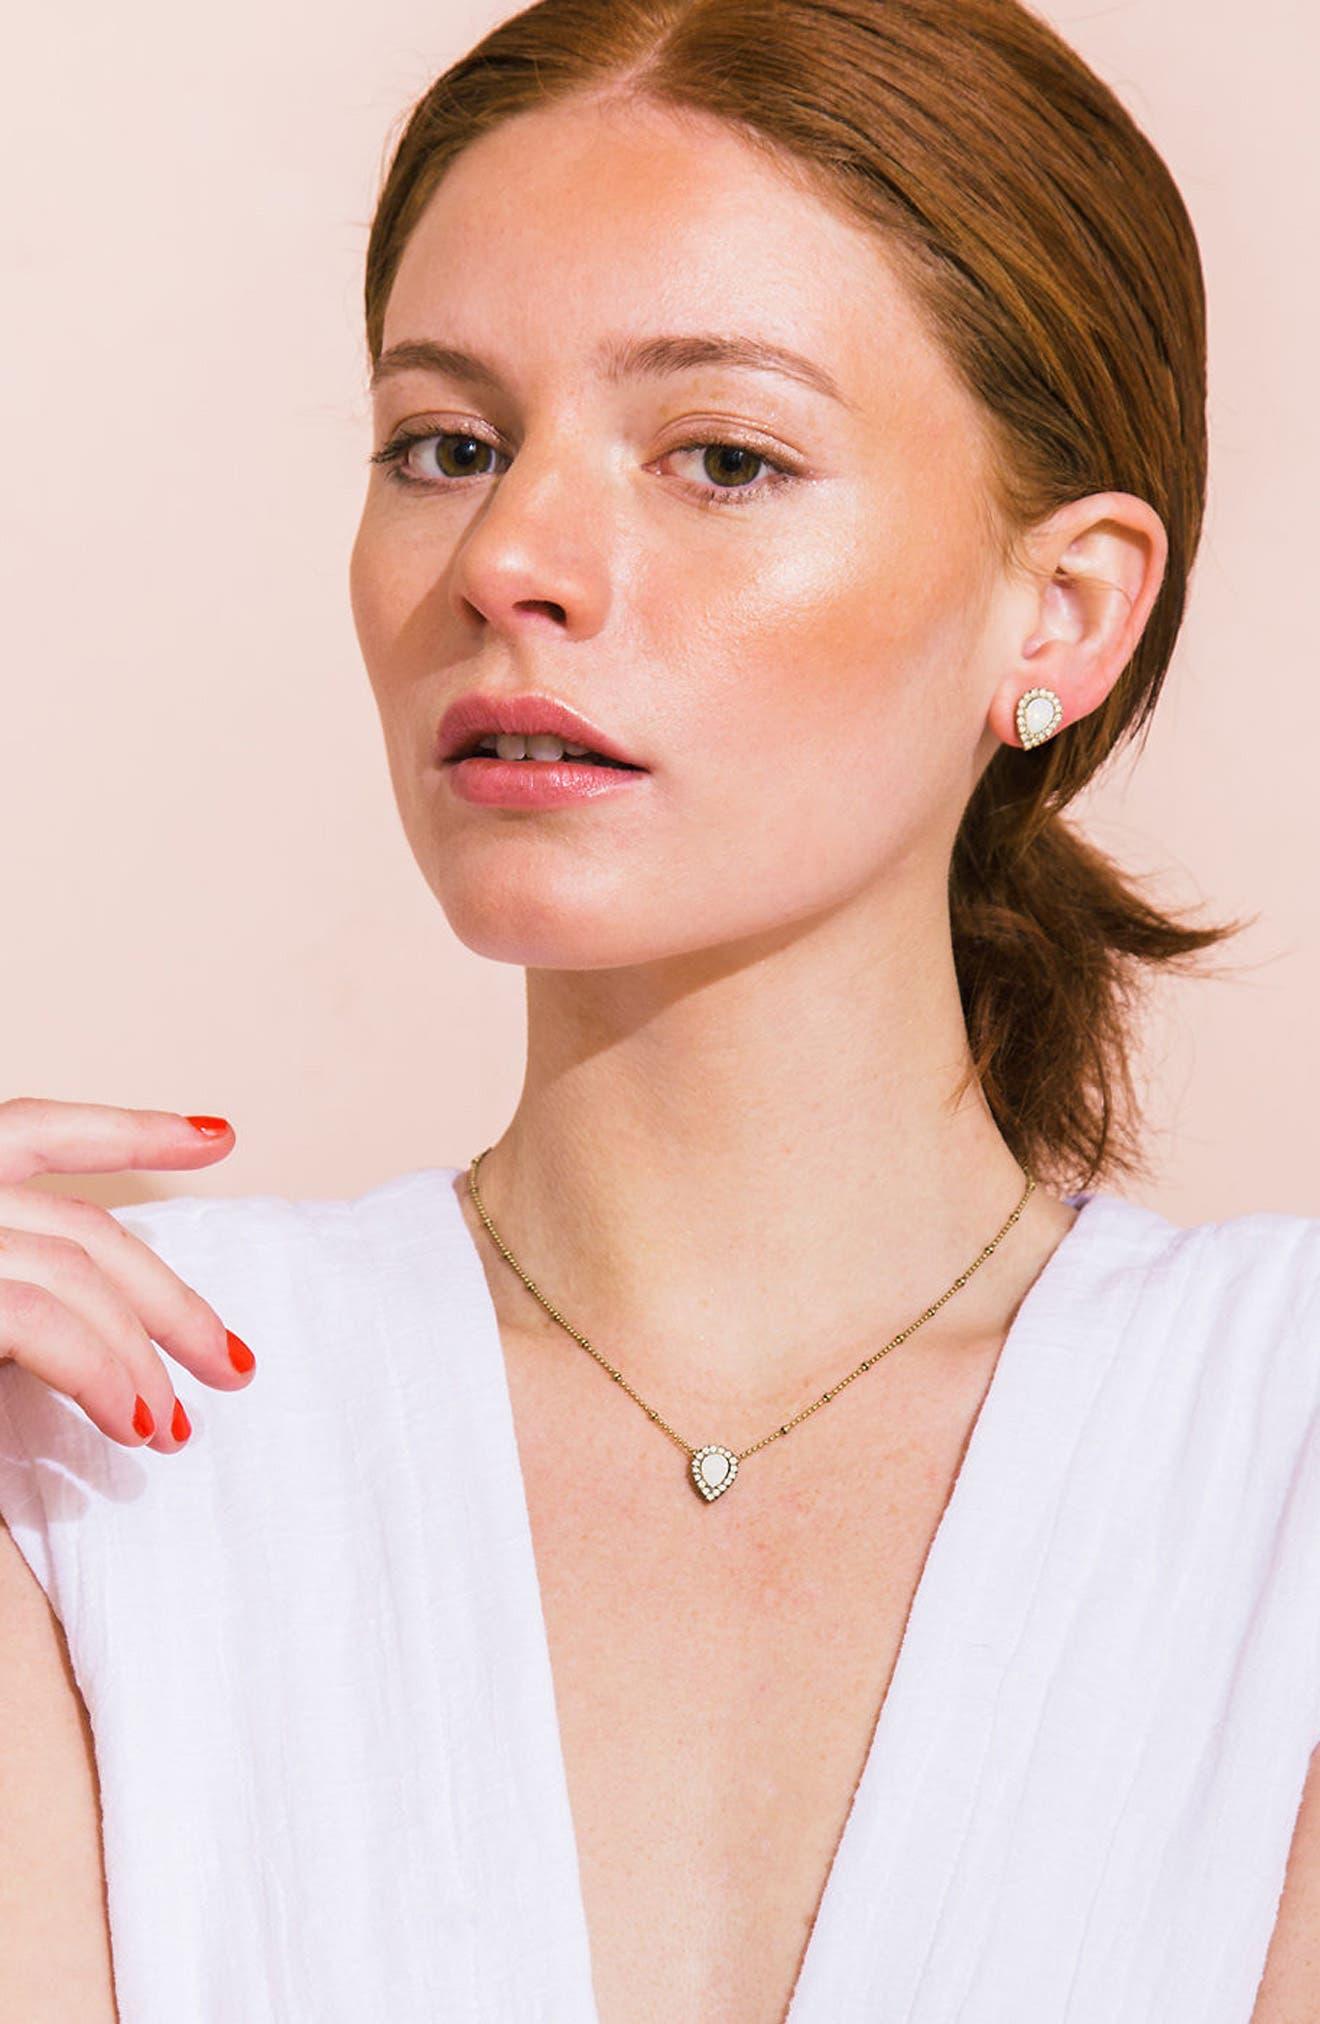 Jamie Teardrop Stud Earrings,                             Alternate thumbnail 3, color,                             GOLD/ WHITE